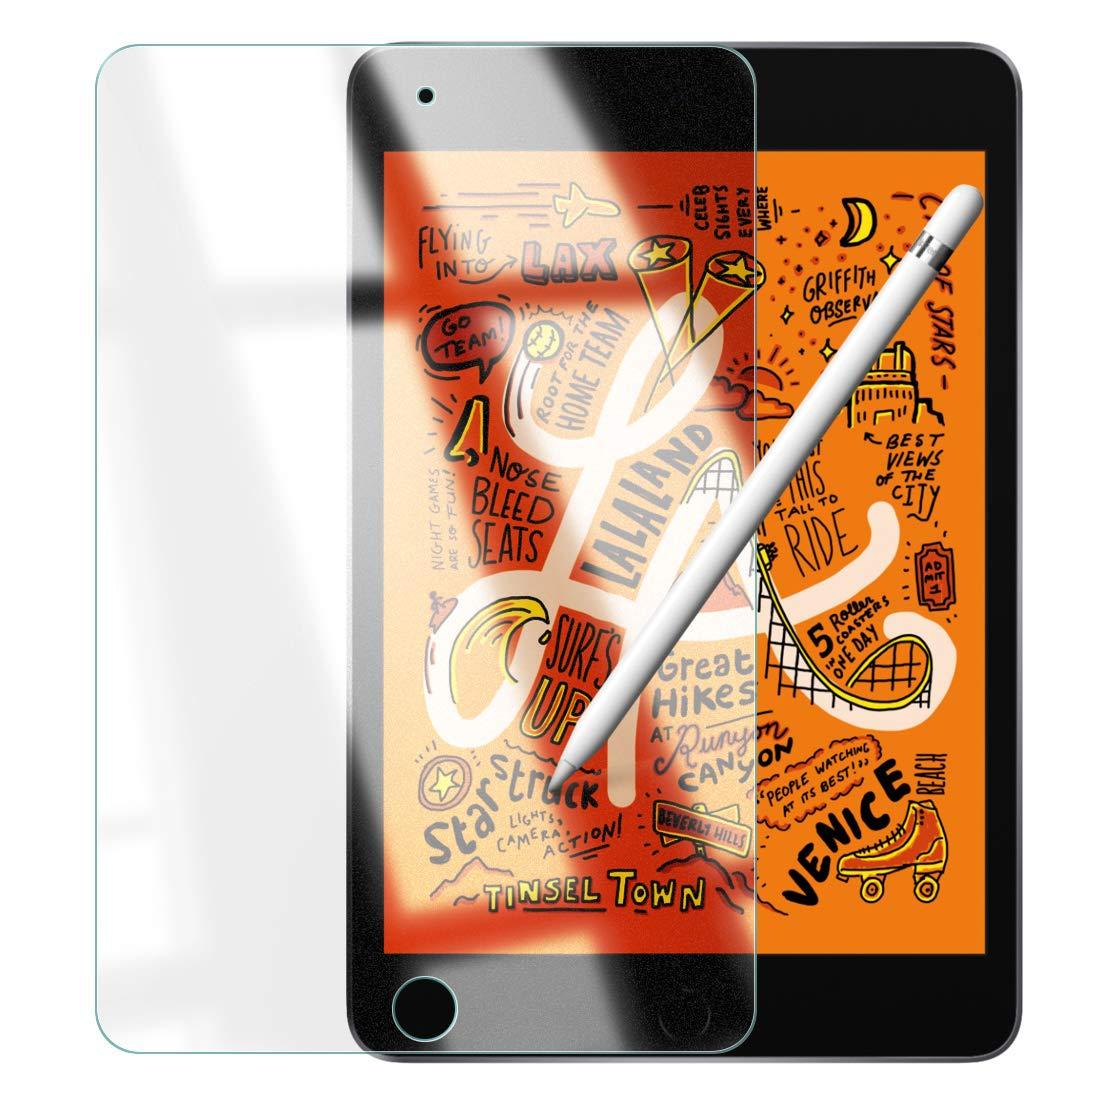 iPad mini 5 第5世代 2019 年 新型 モデル 【サラサラ度UP】 O型 反射低減 アンチグレア + ペーパーライク 中間感触 絶妙サイズ ガラスフィルム iPad mini 4 2015 新型 第4世代 7.9 インチ 対応 ノングレア タイプ 指紋防止 ApplePencil(第1世代)対応 強化ガラス 液晶 保護フィルム 荒野行動 対応 保護 ガラス フィルム 全面保護 ケース 衝撃 軽量 薄型 レザー 3D タッチ 薄型 手帳 カバー 対応 気泡防止 日本製 素材 【WANLOK】9H 2.5D 0.3mm iPadmini AG 345